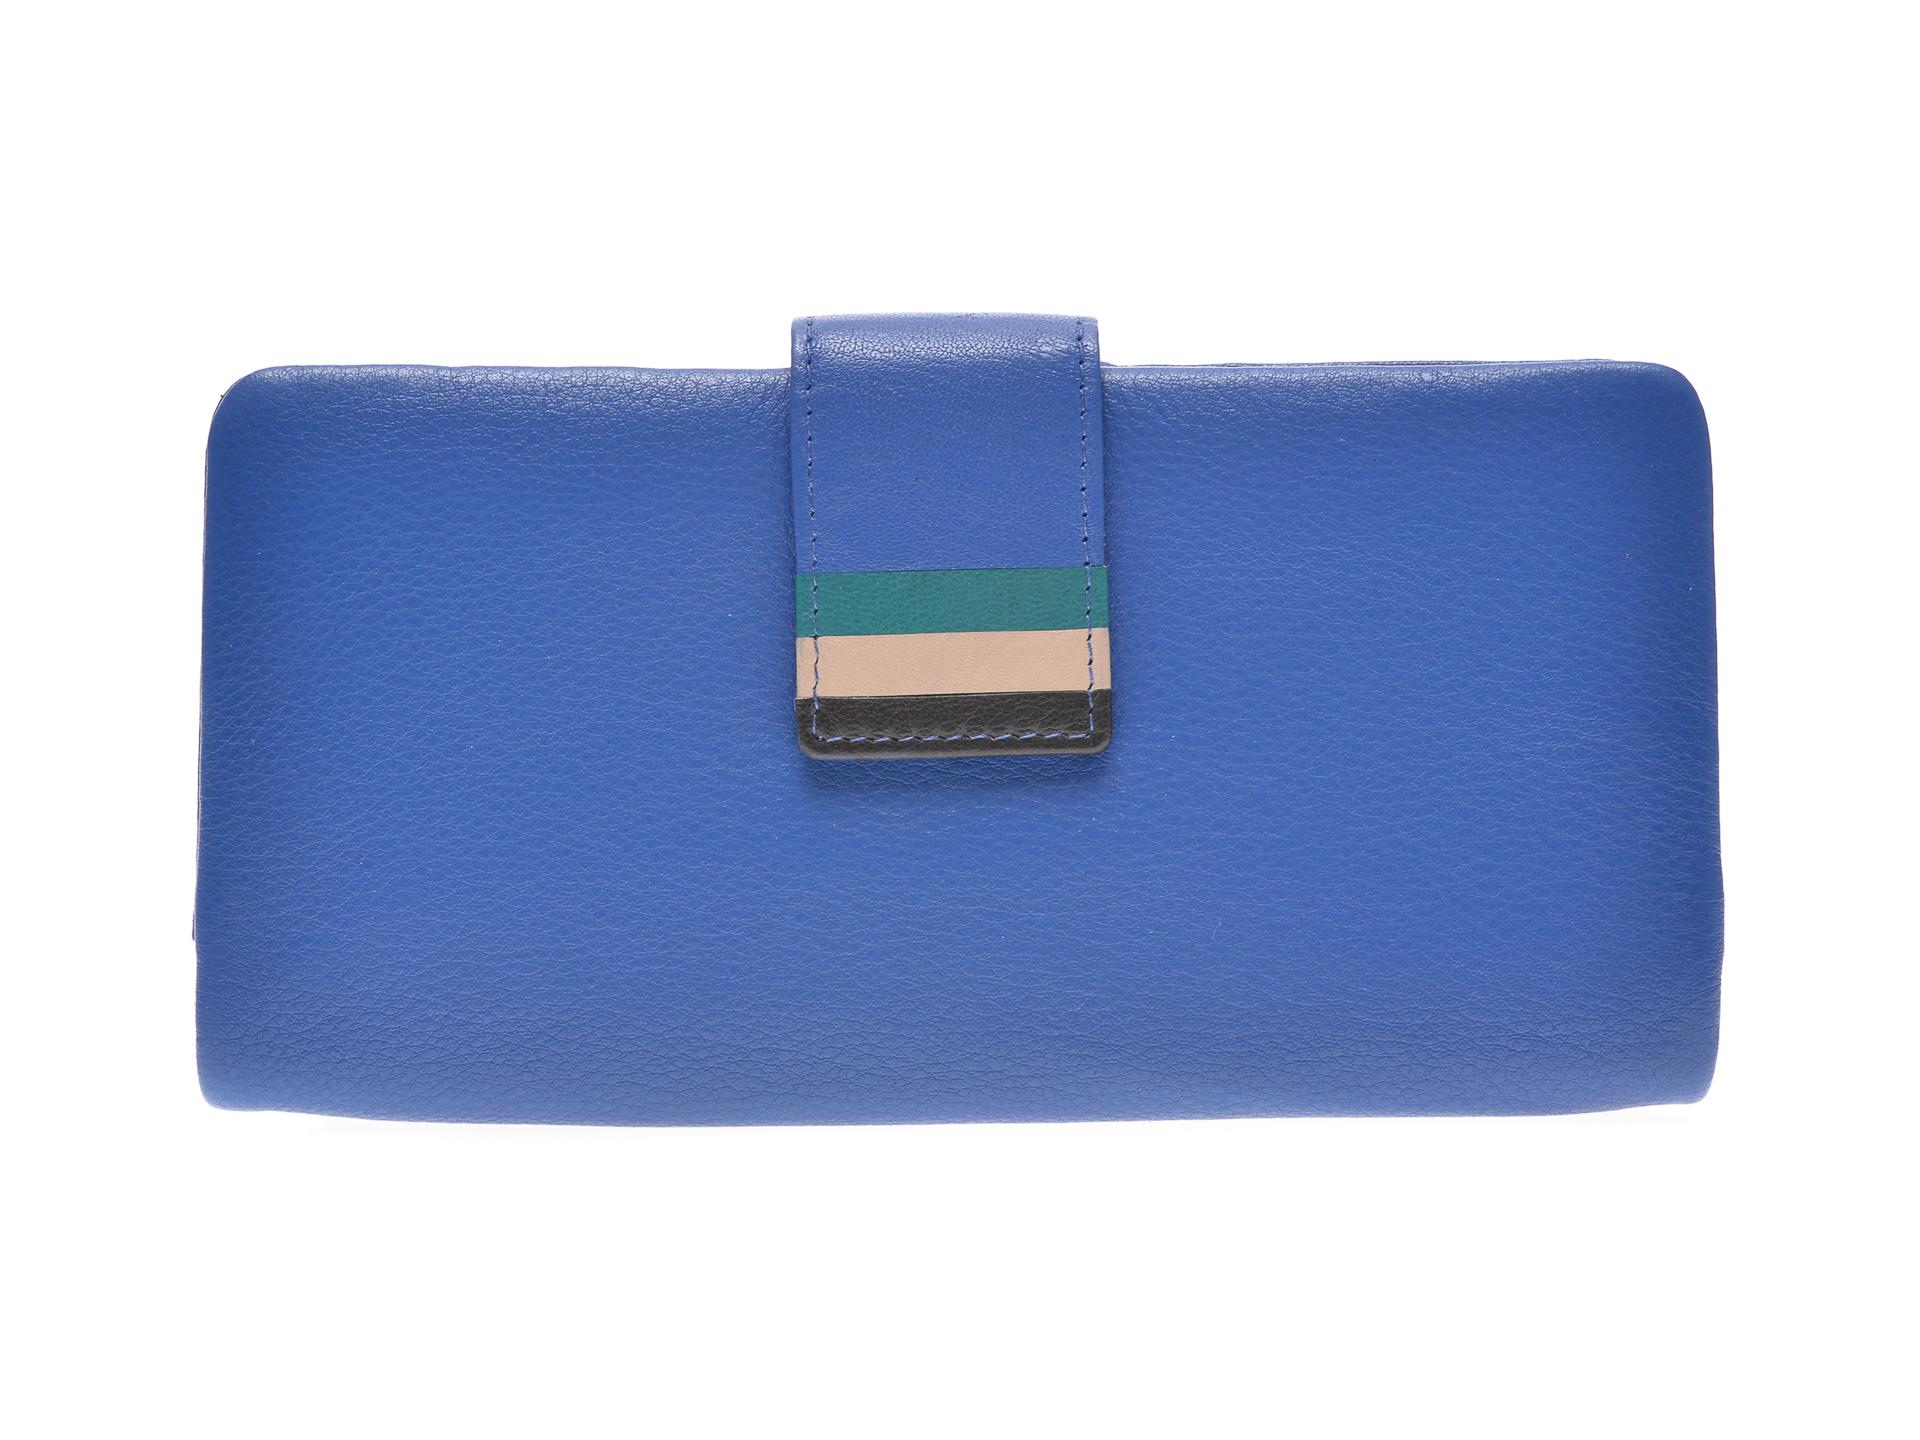 Portofel EPICA albastru, 7081, din piele naturala imagine